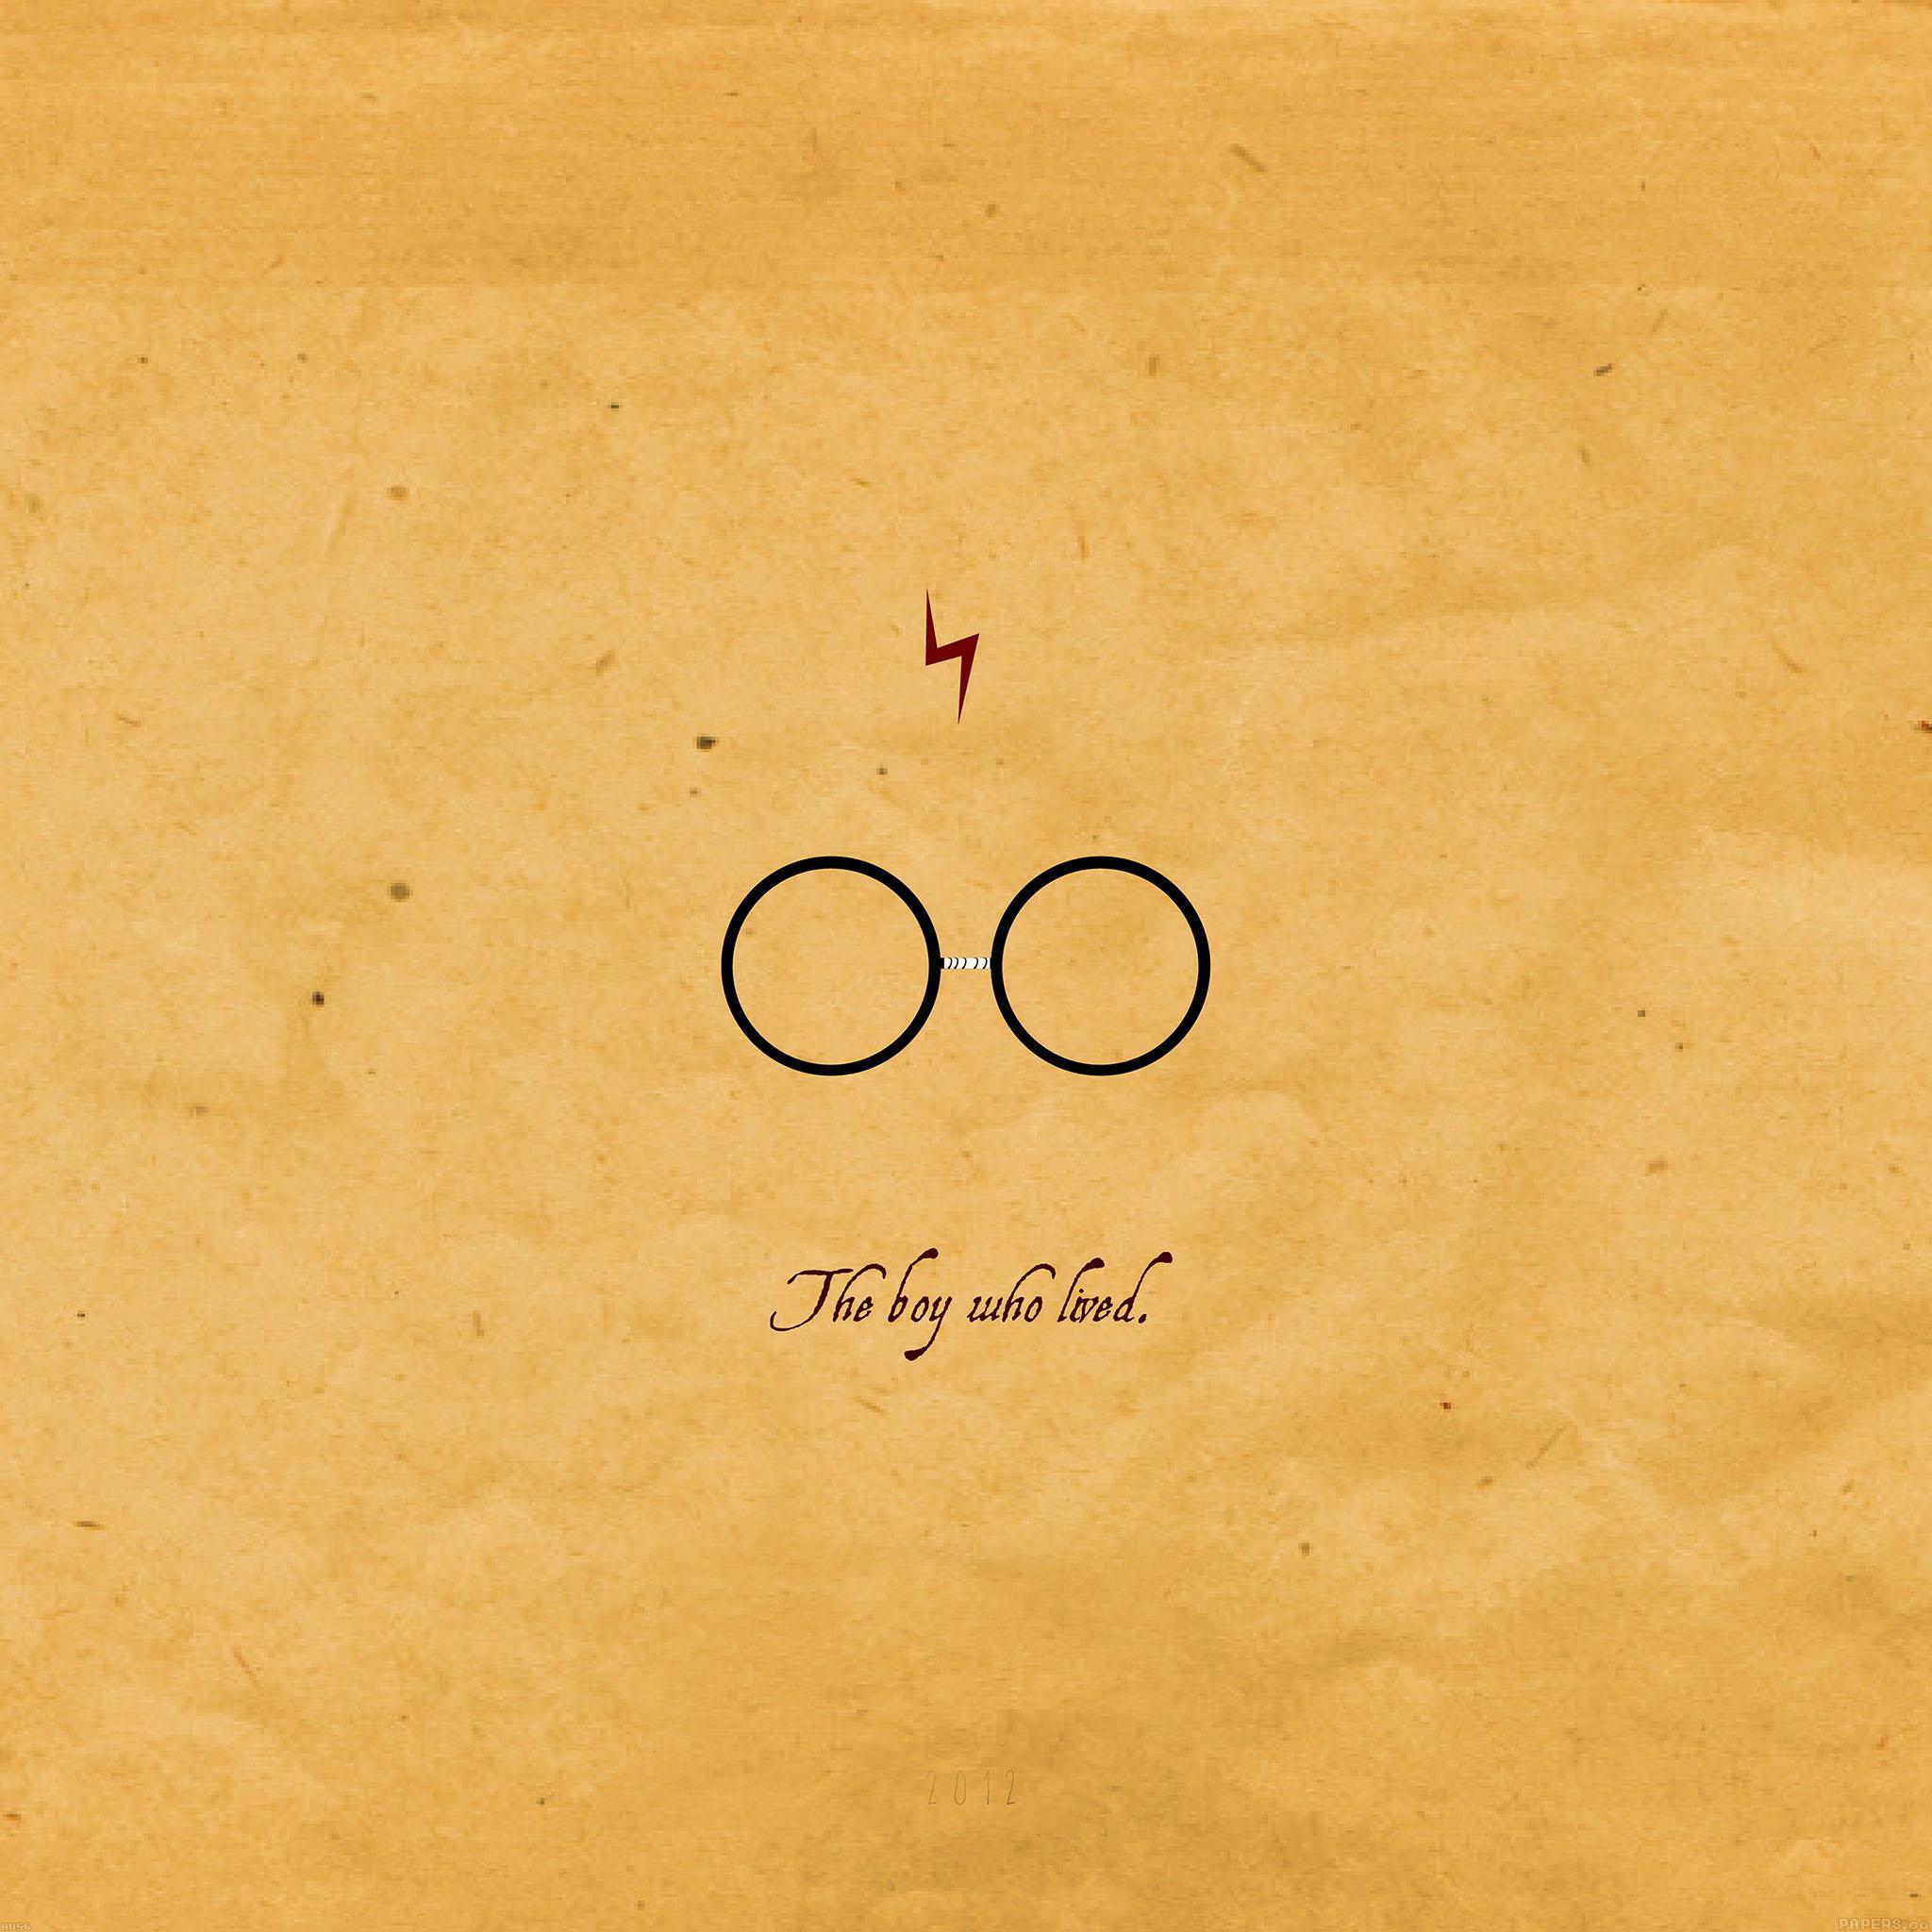 Most Inspiring Wallpaper Harry Potter Apple - papers  Photograph_959661.jpg